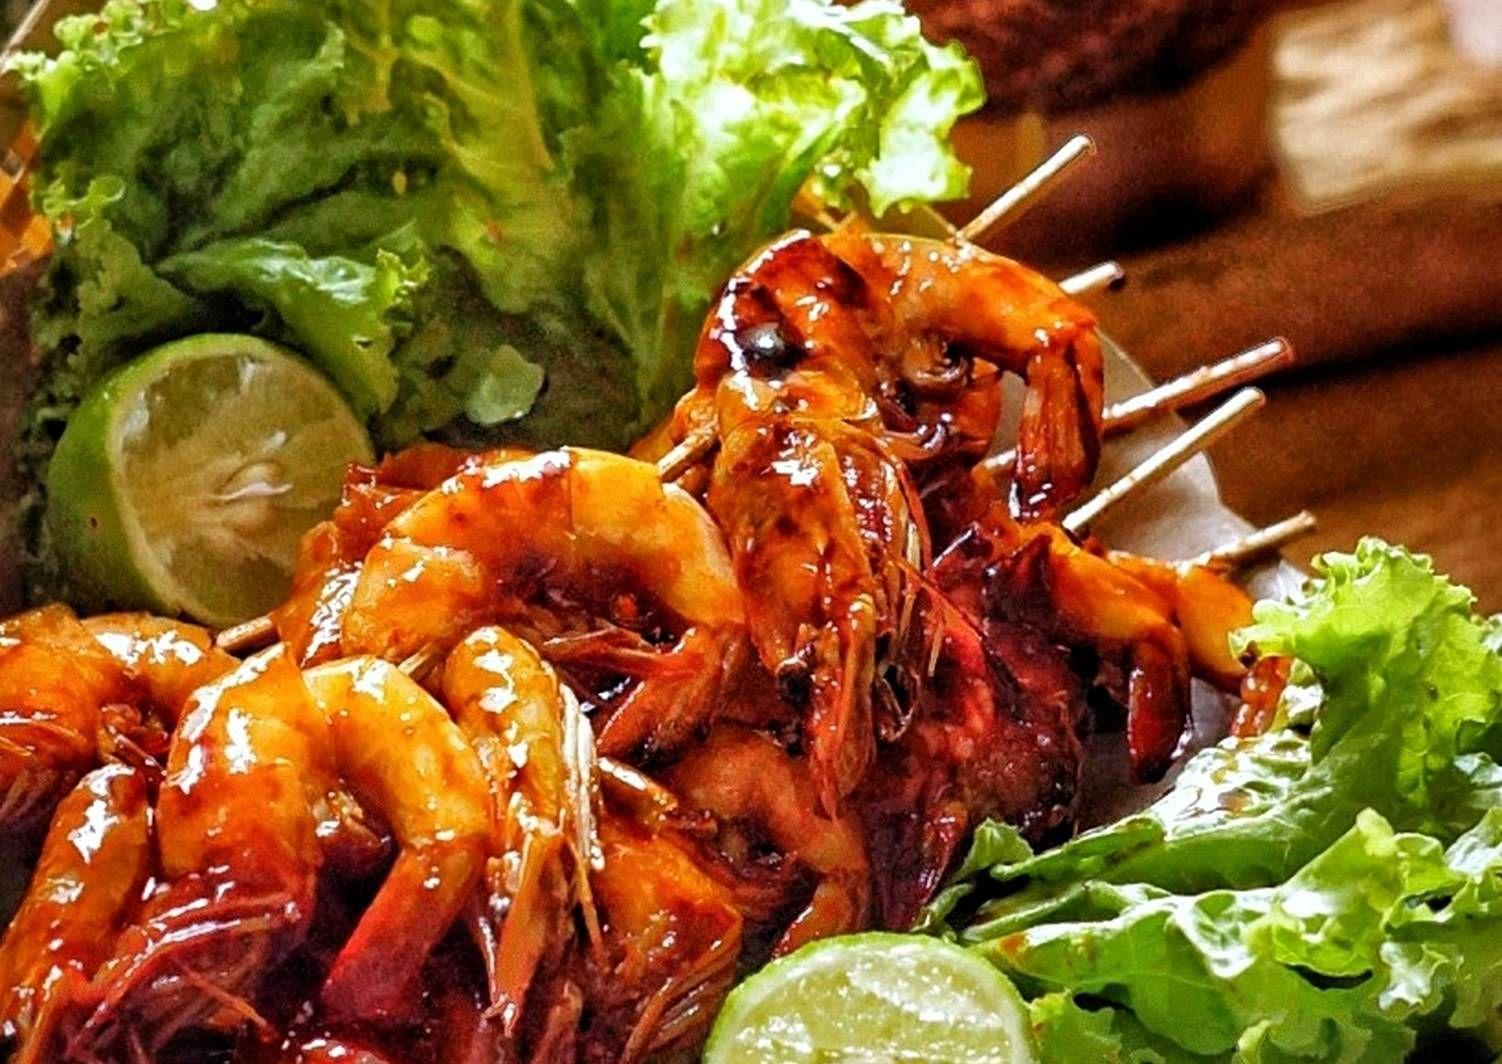 Resep Udang Bakar Saus Madu Yummy Oleh Shirley Wijaya Resep Resep Udang Resep Udang Bakar Resep Masakan Indonesia